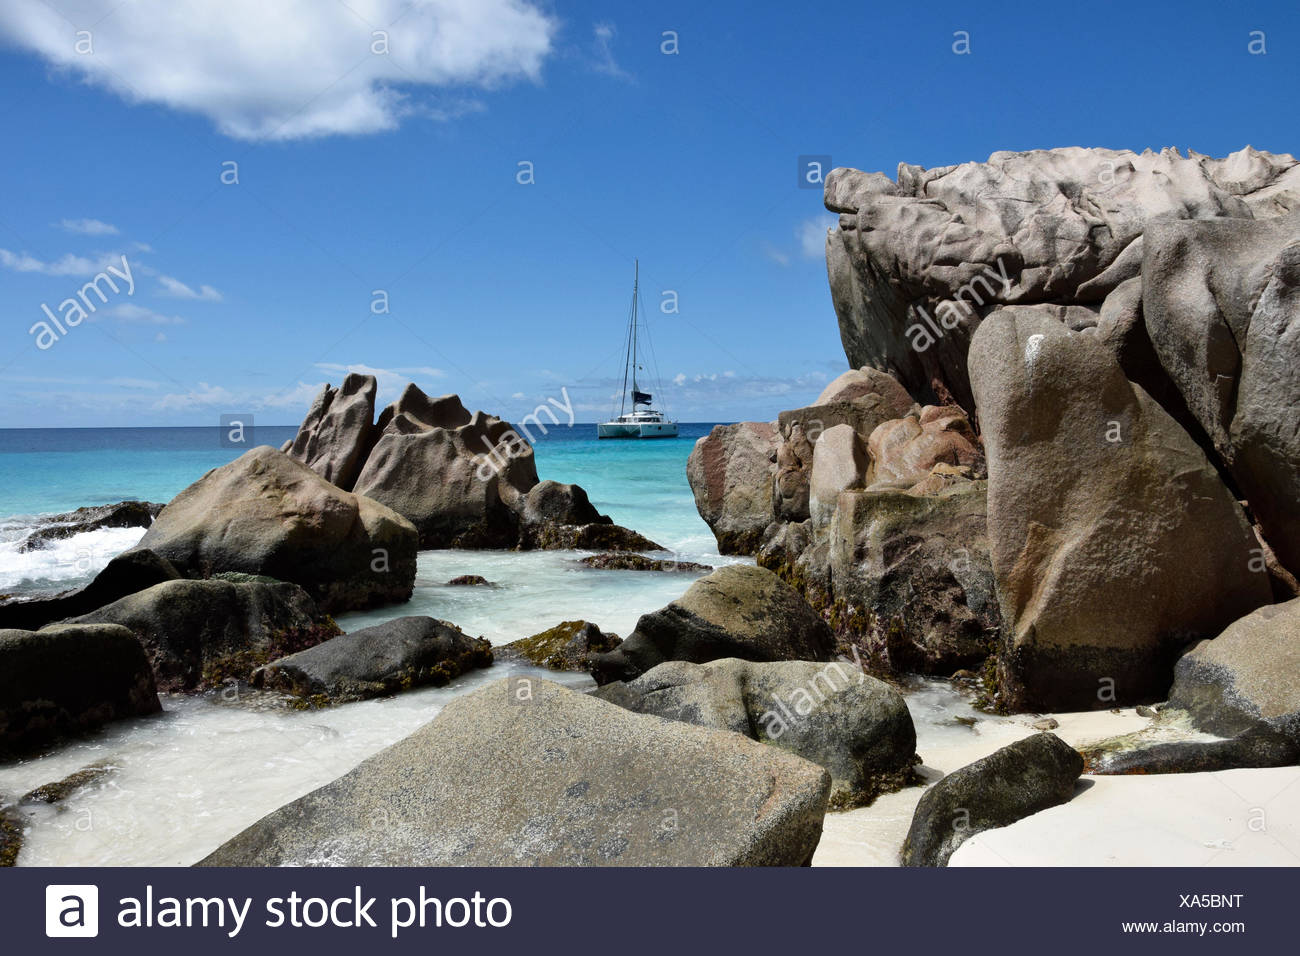 Anse Patatas, boat, granite rock, rock, La Digue, sea, water, Seychelles, Africa, beach, seashore, - Stock Image